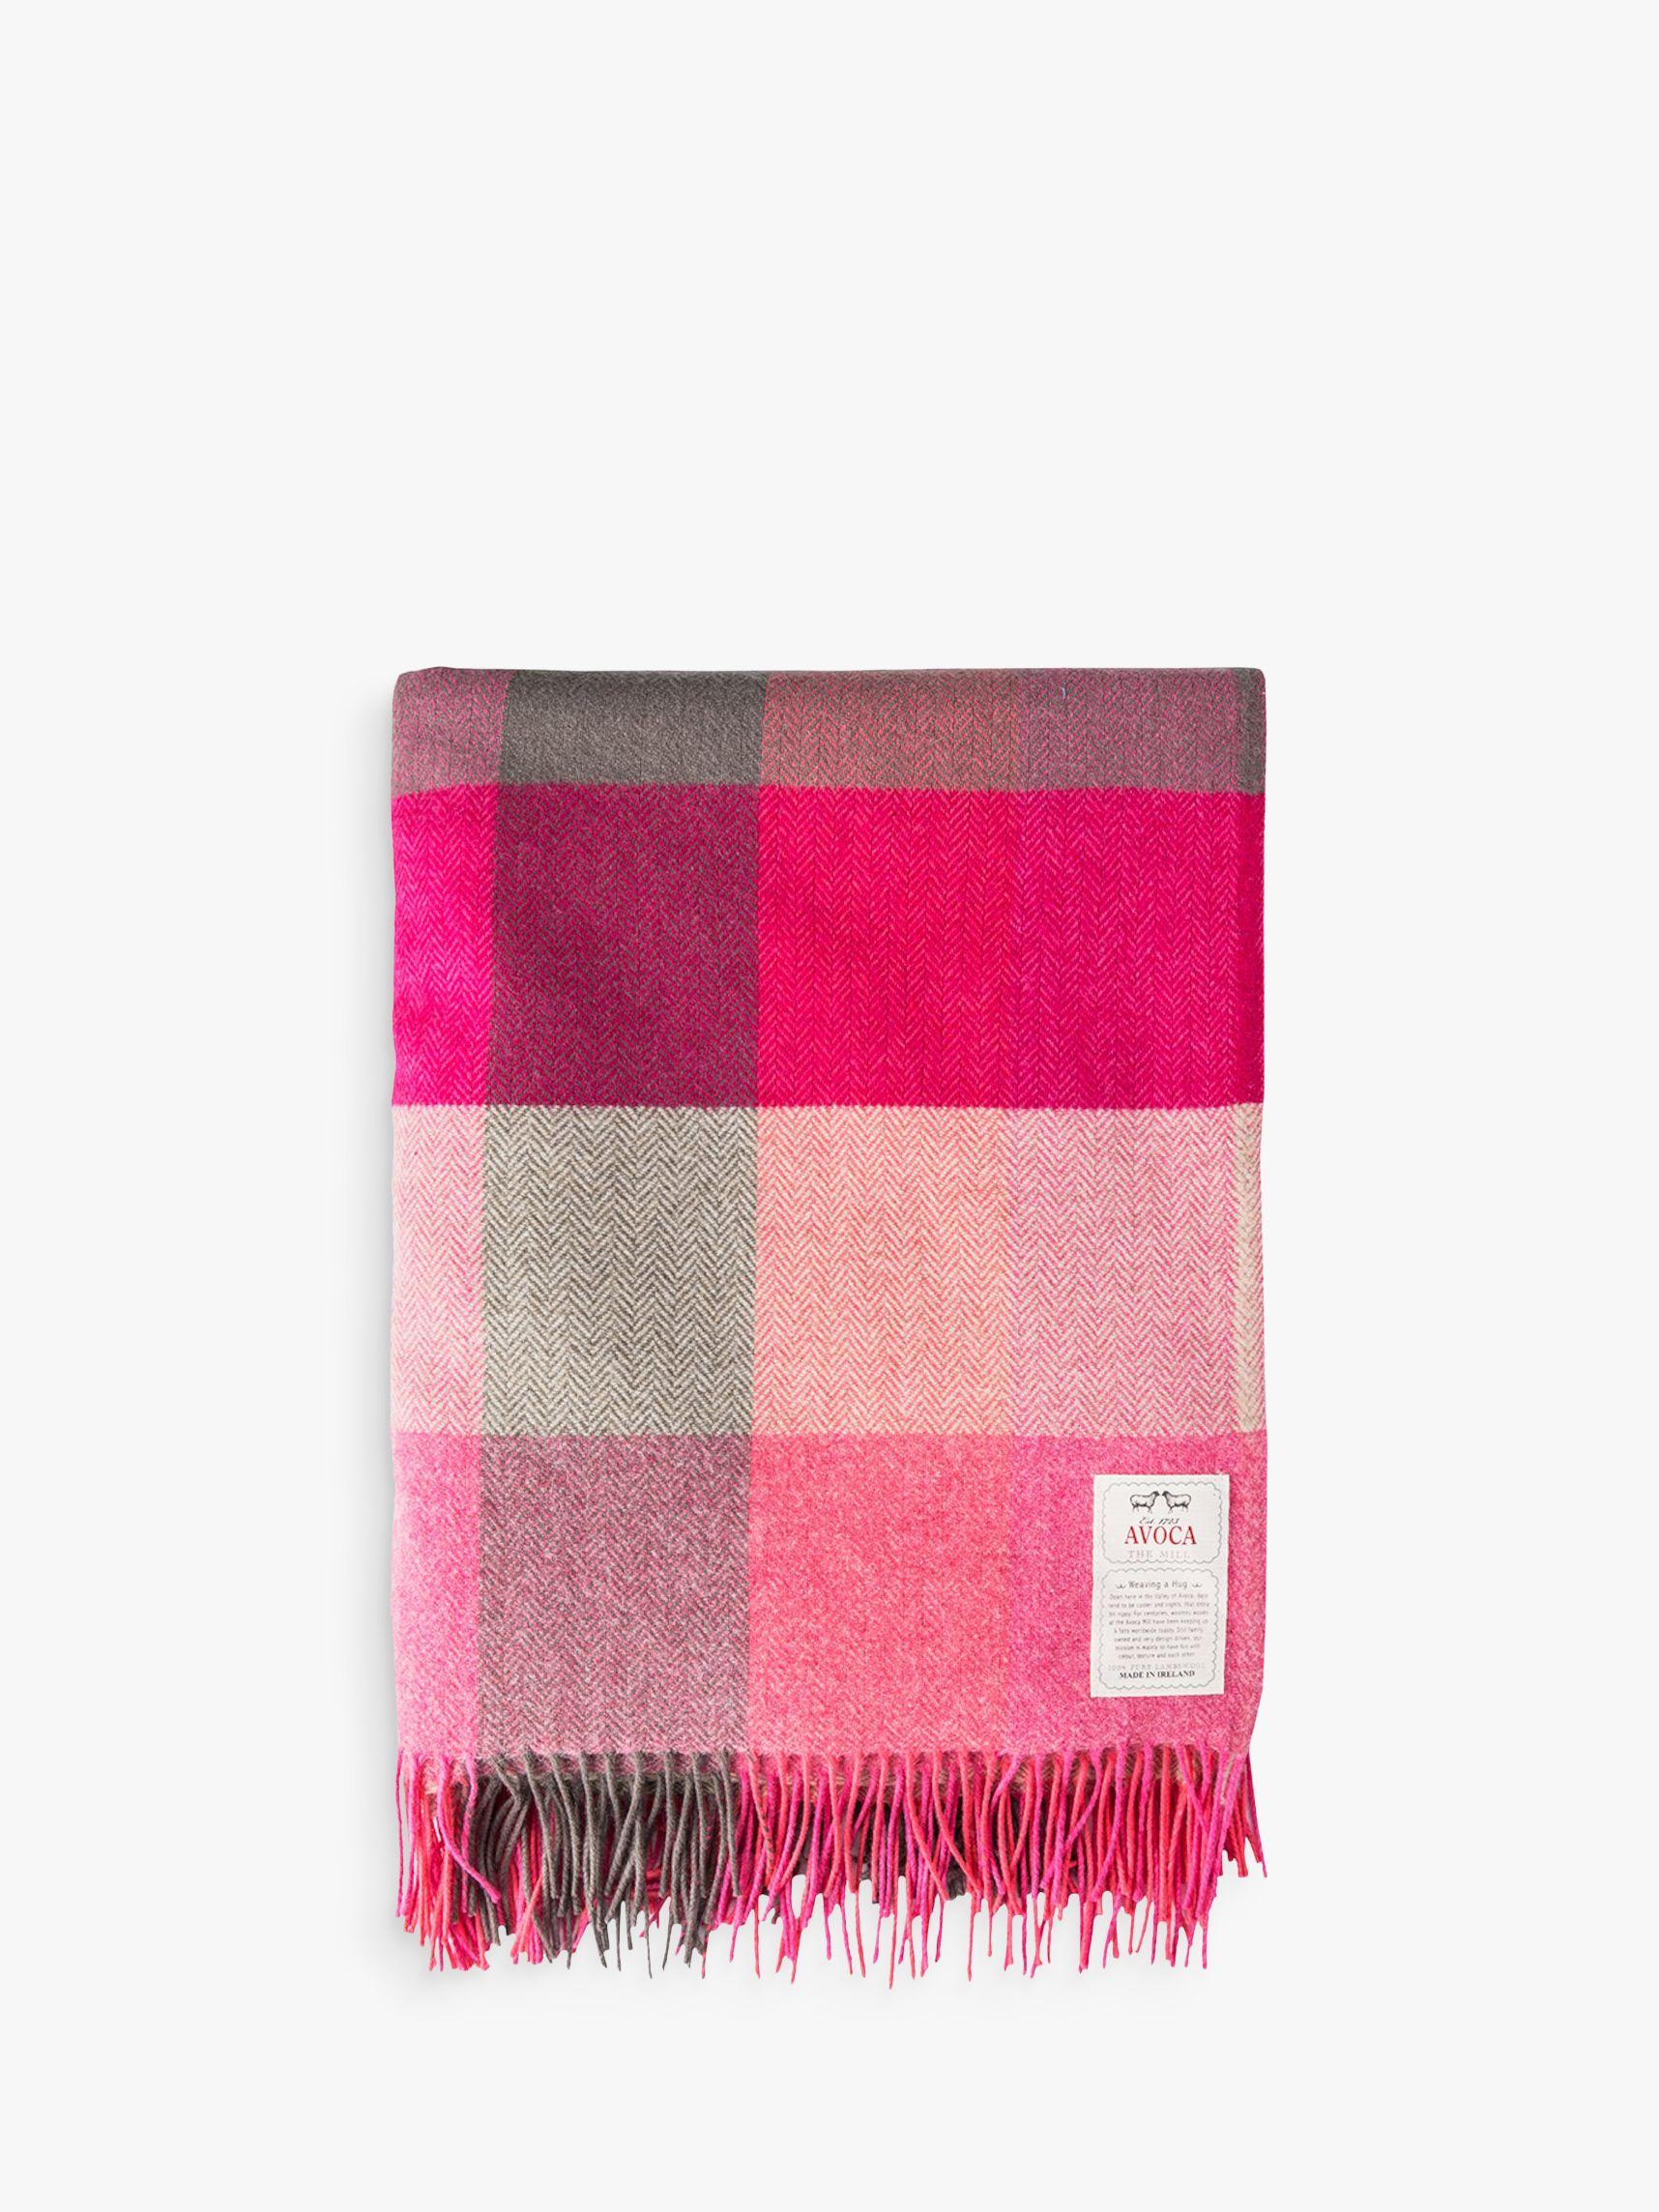 Avoca Avoca Pink Fields Lambswool Throw, Pink